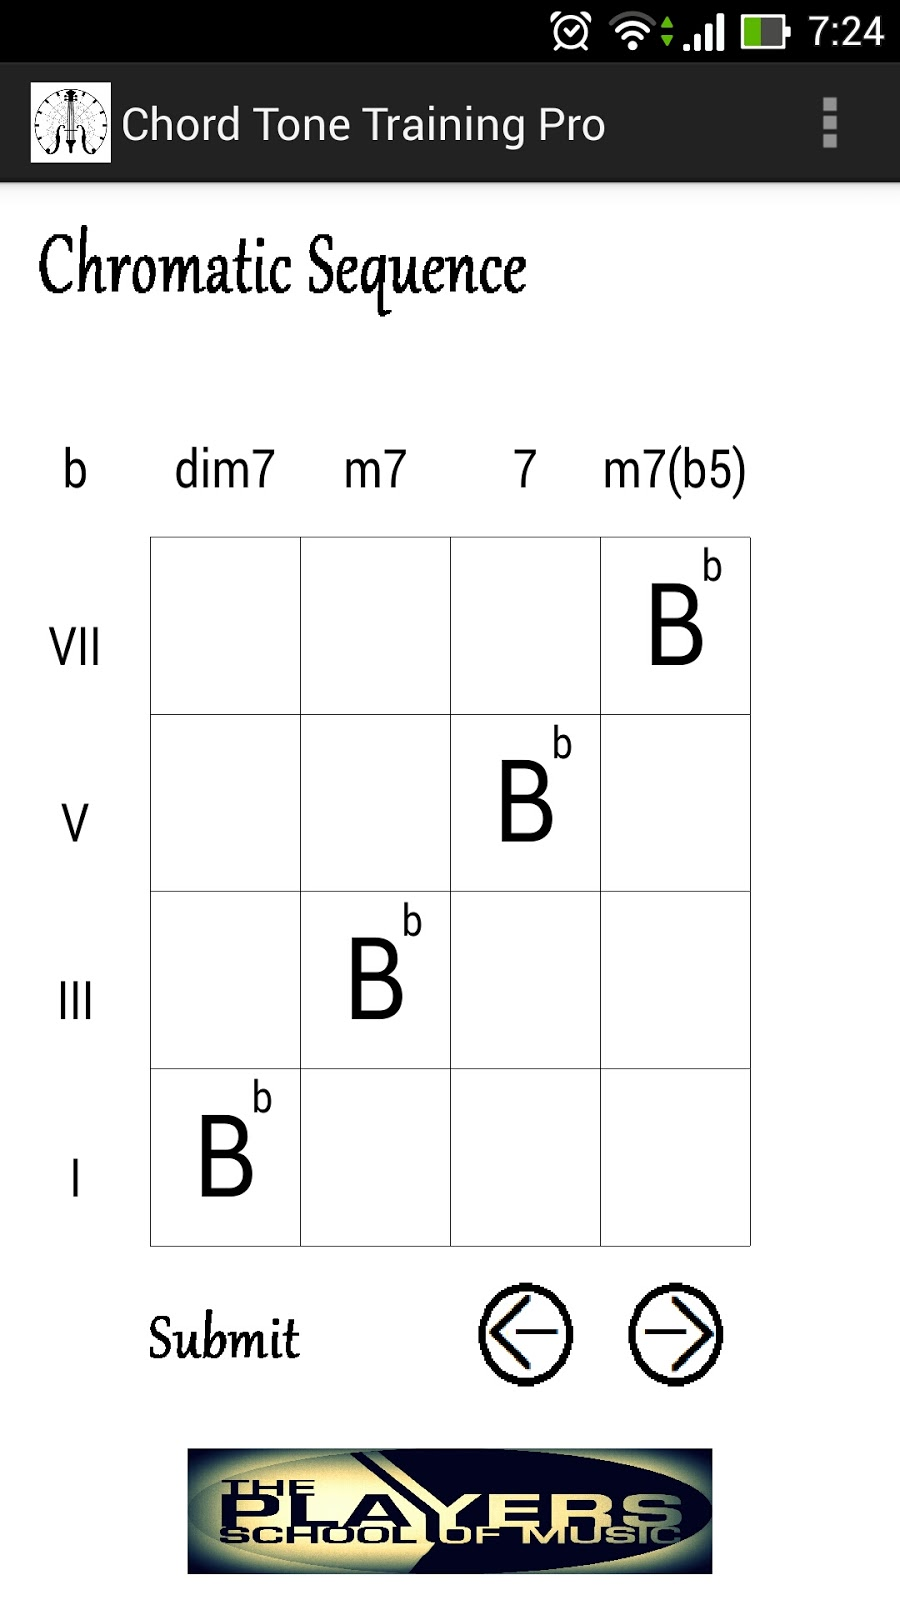 Daniel的音樂學習筆記: (5)和弦組成音練習程式 - Chord Tone Training Pro